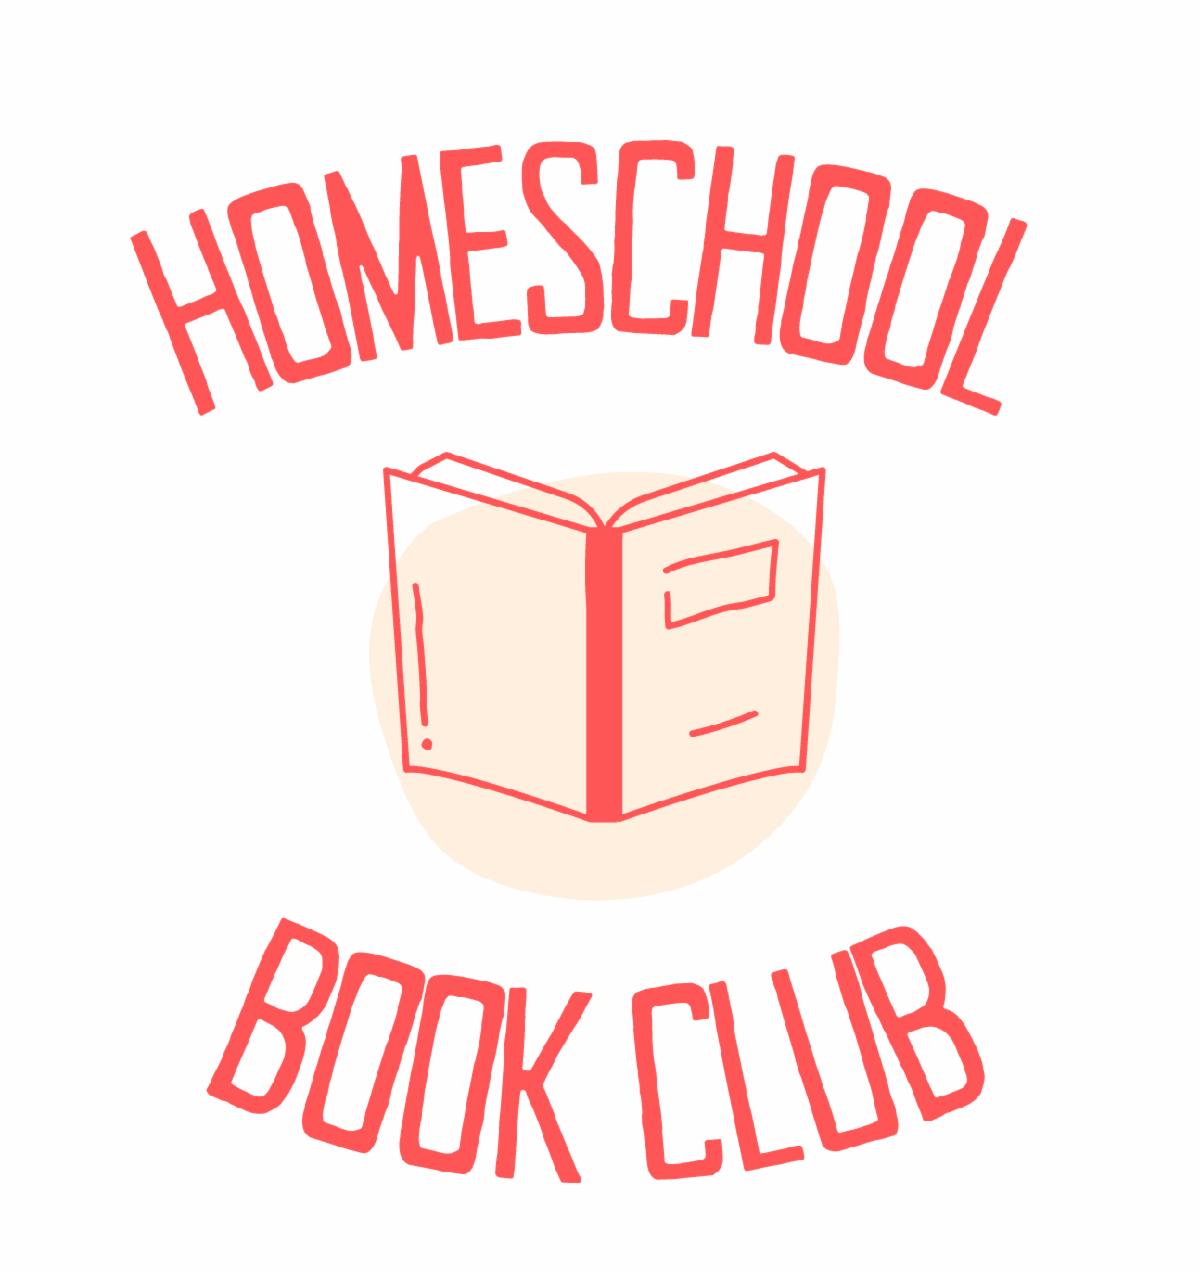 Homeschool Book Club.png